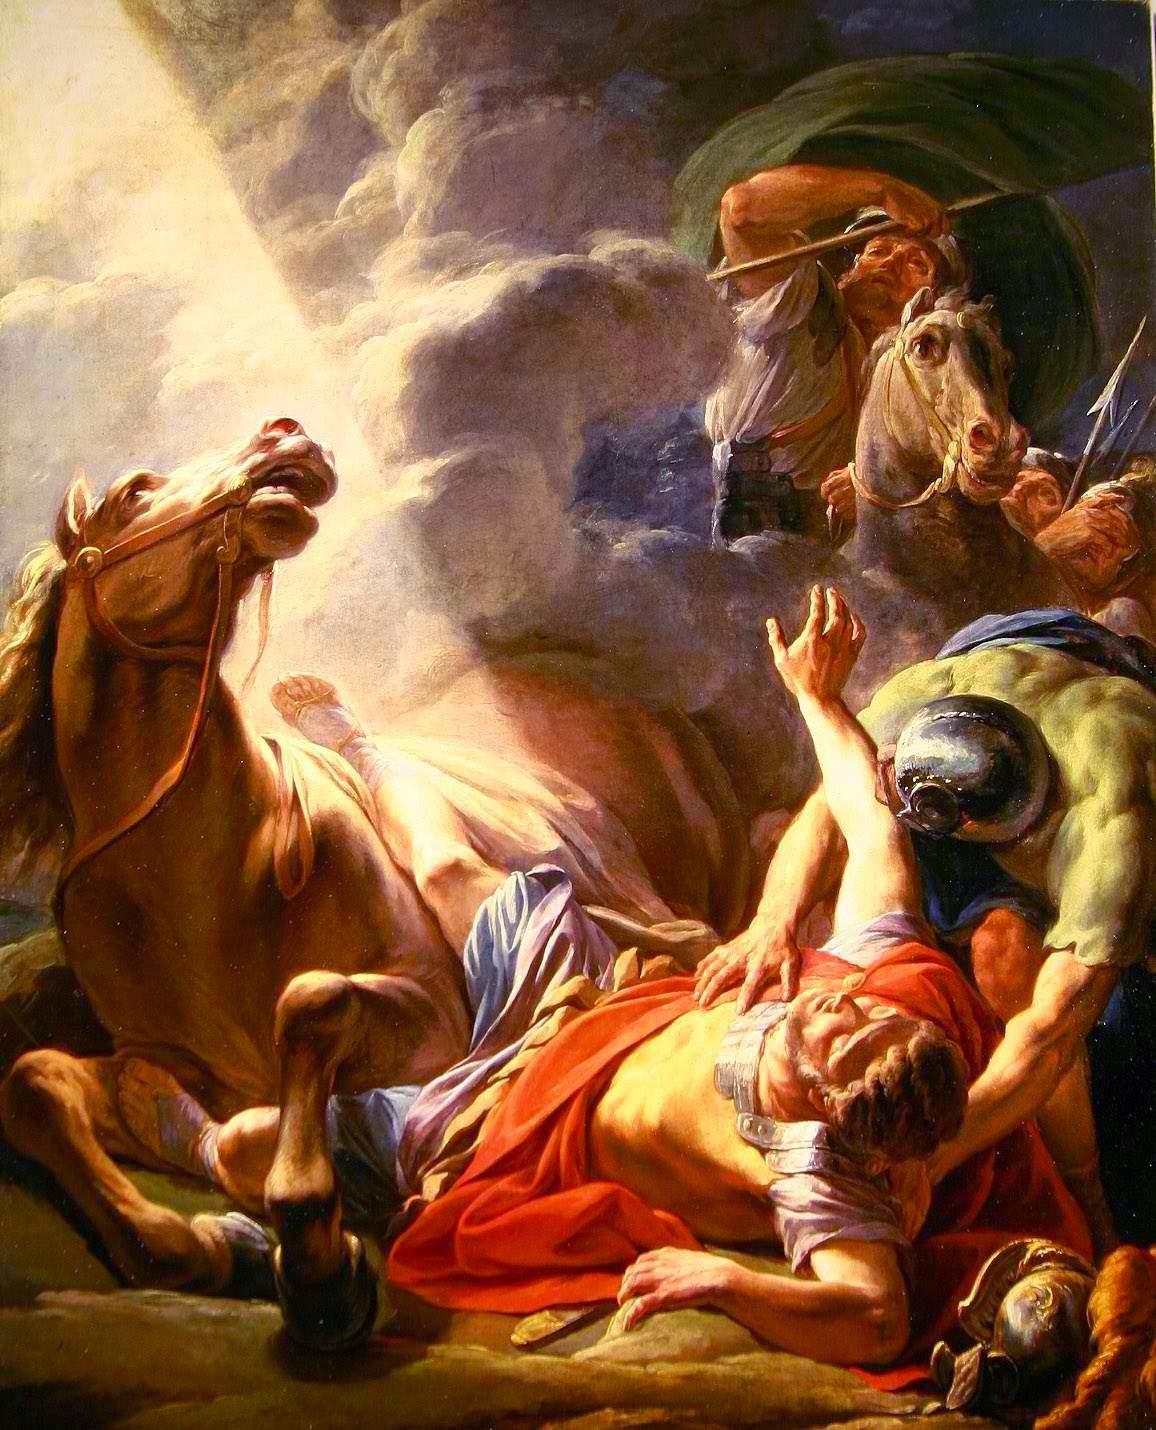 http://anglicanradio.blogspot.com/2015/01/the-conversion-of-saint-paul.html